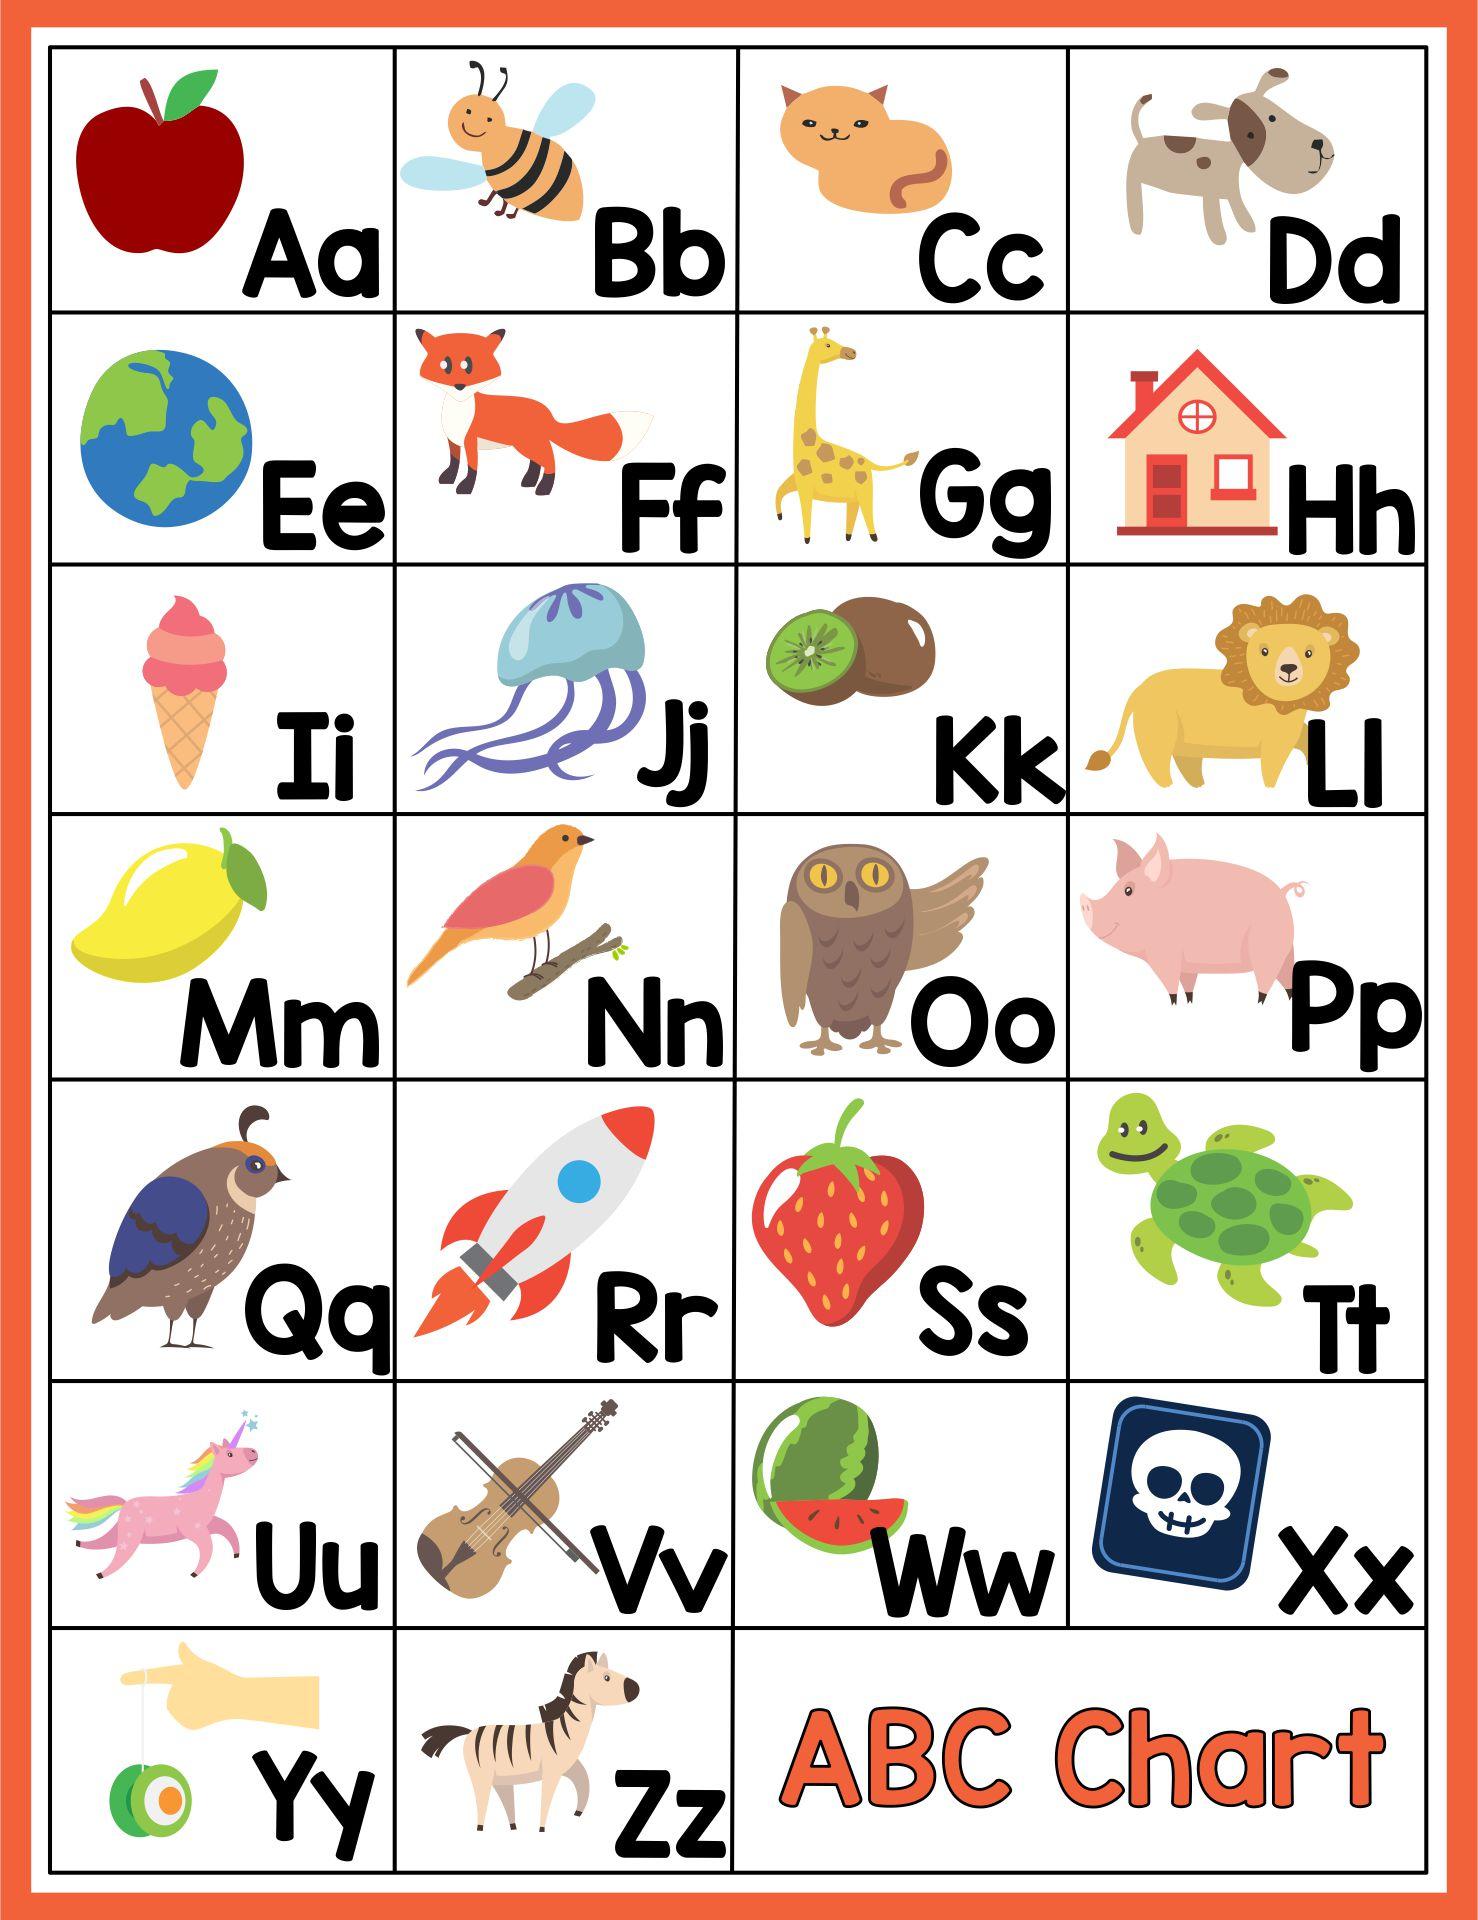 10 Best Alphabet Sounds Chart Printable Printablee Com